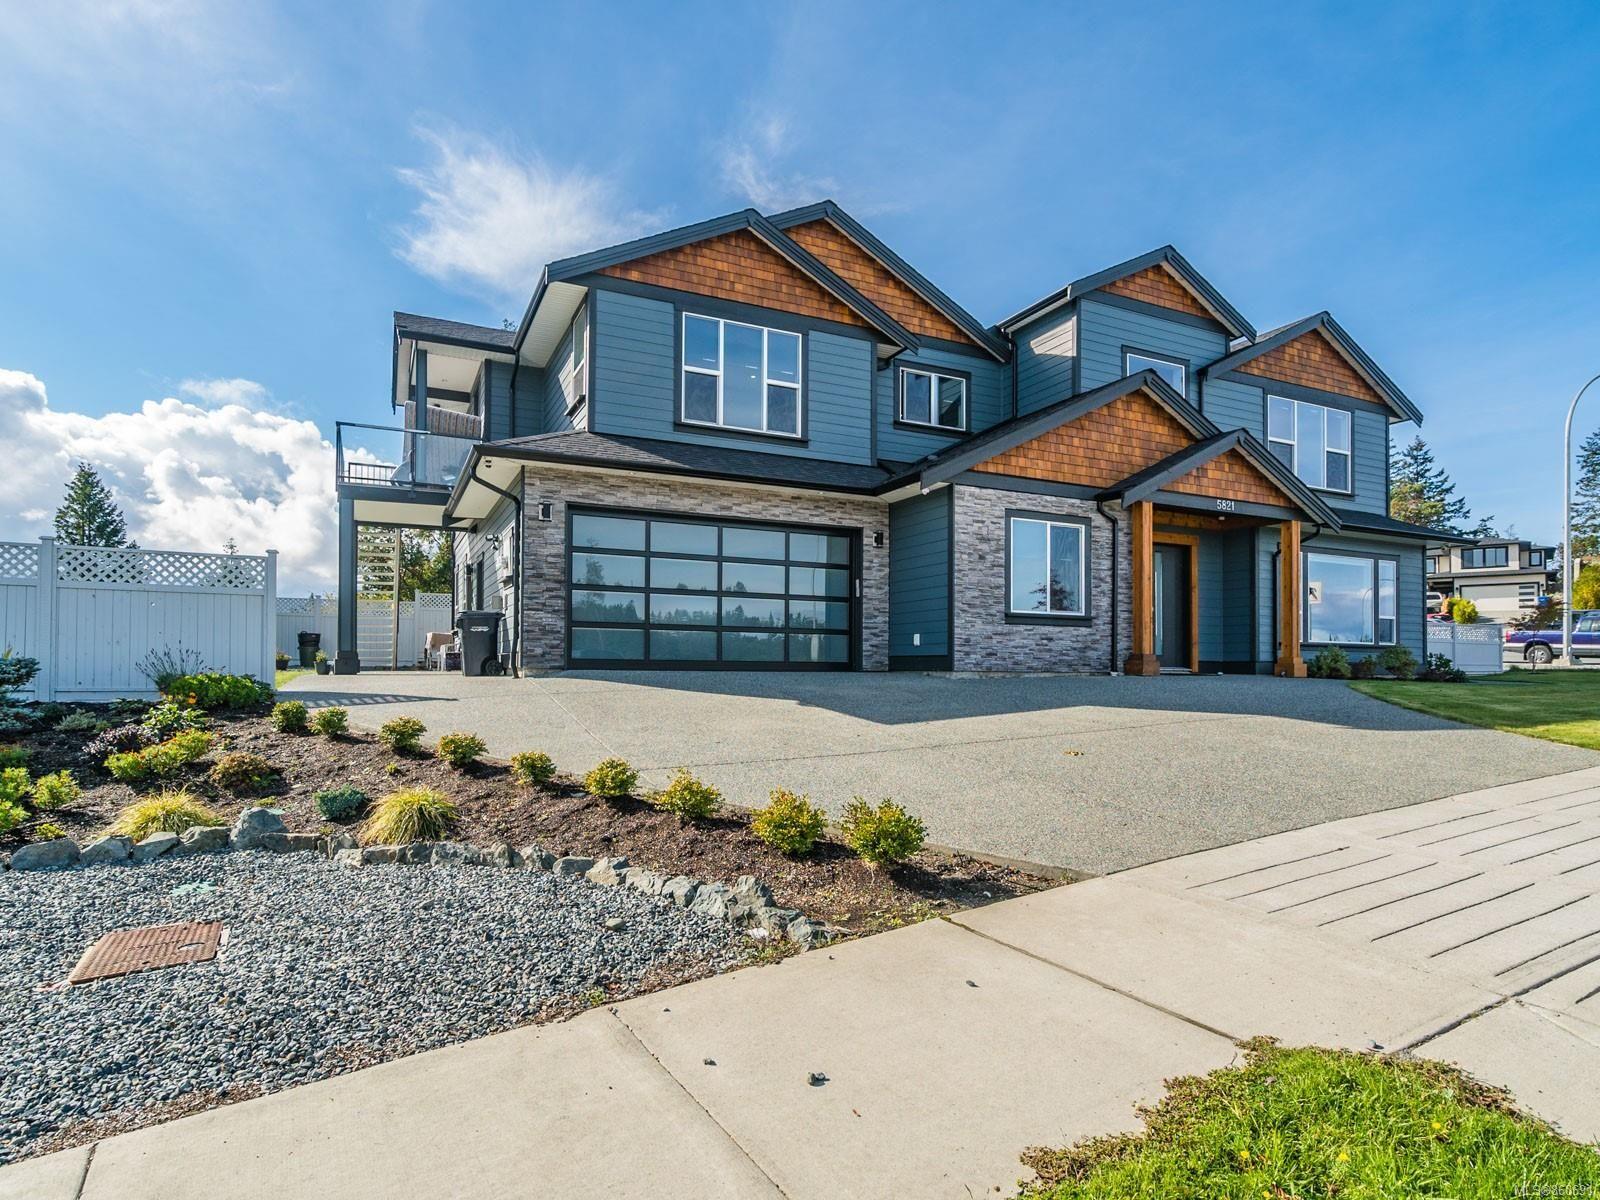 Photo 4: Photos: 5821 Linley Valley Dr in : Na North Nanaimo House for sale (Nanaimo)  : MLS®# 860691